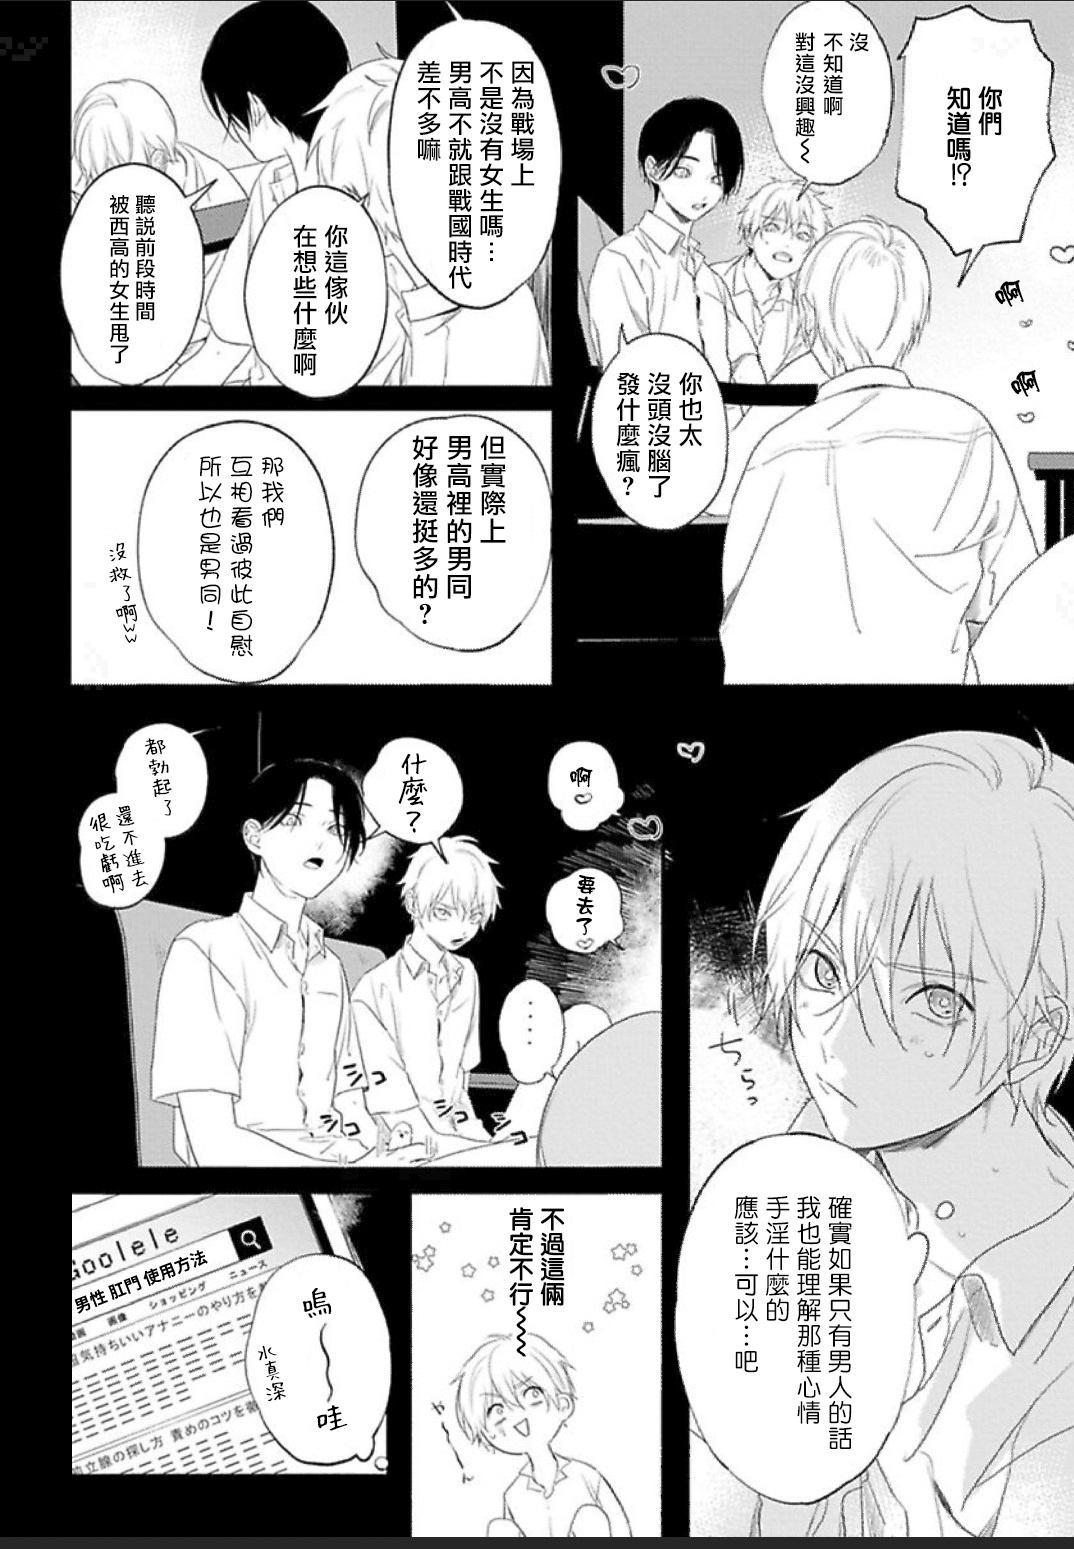 [Utata Hakuto] Houkago Virginity - Virginity afterschool 1-3 [Chinese] [拾荒者汉化组] [Digital] 3